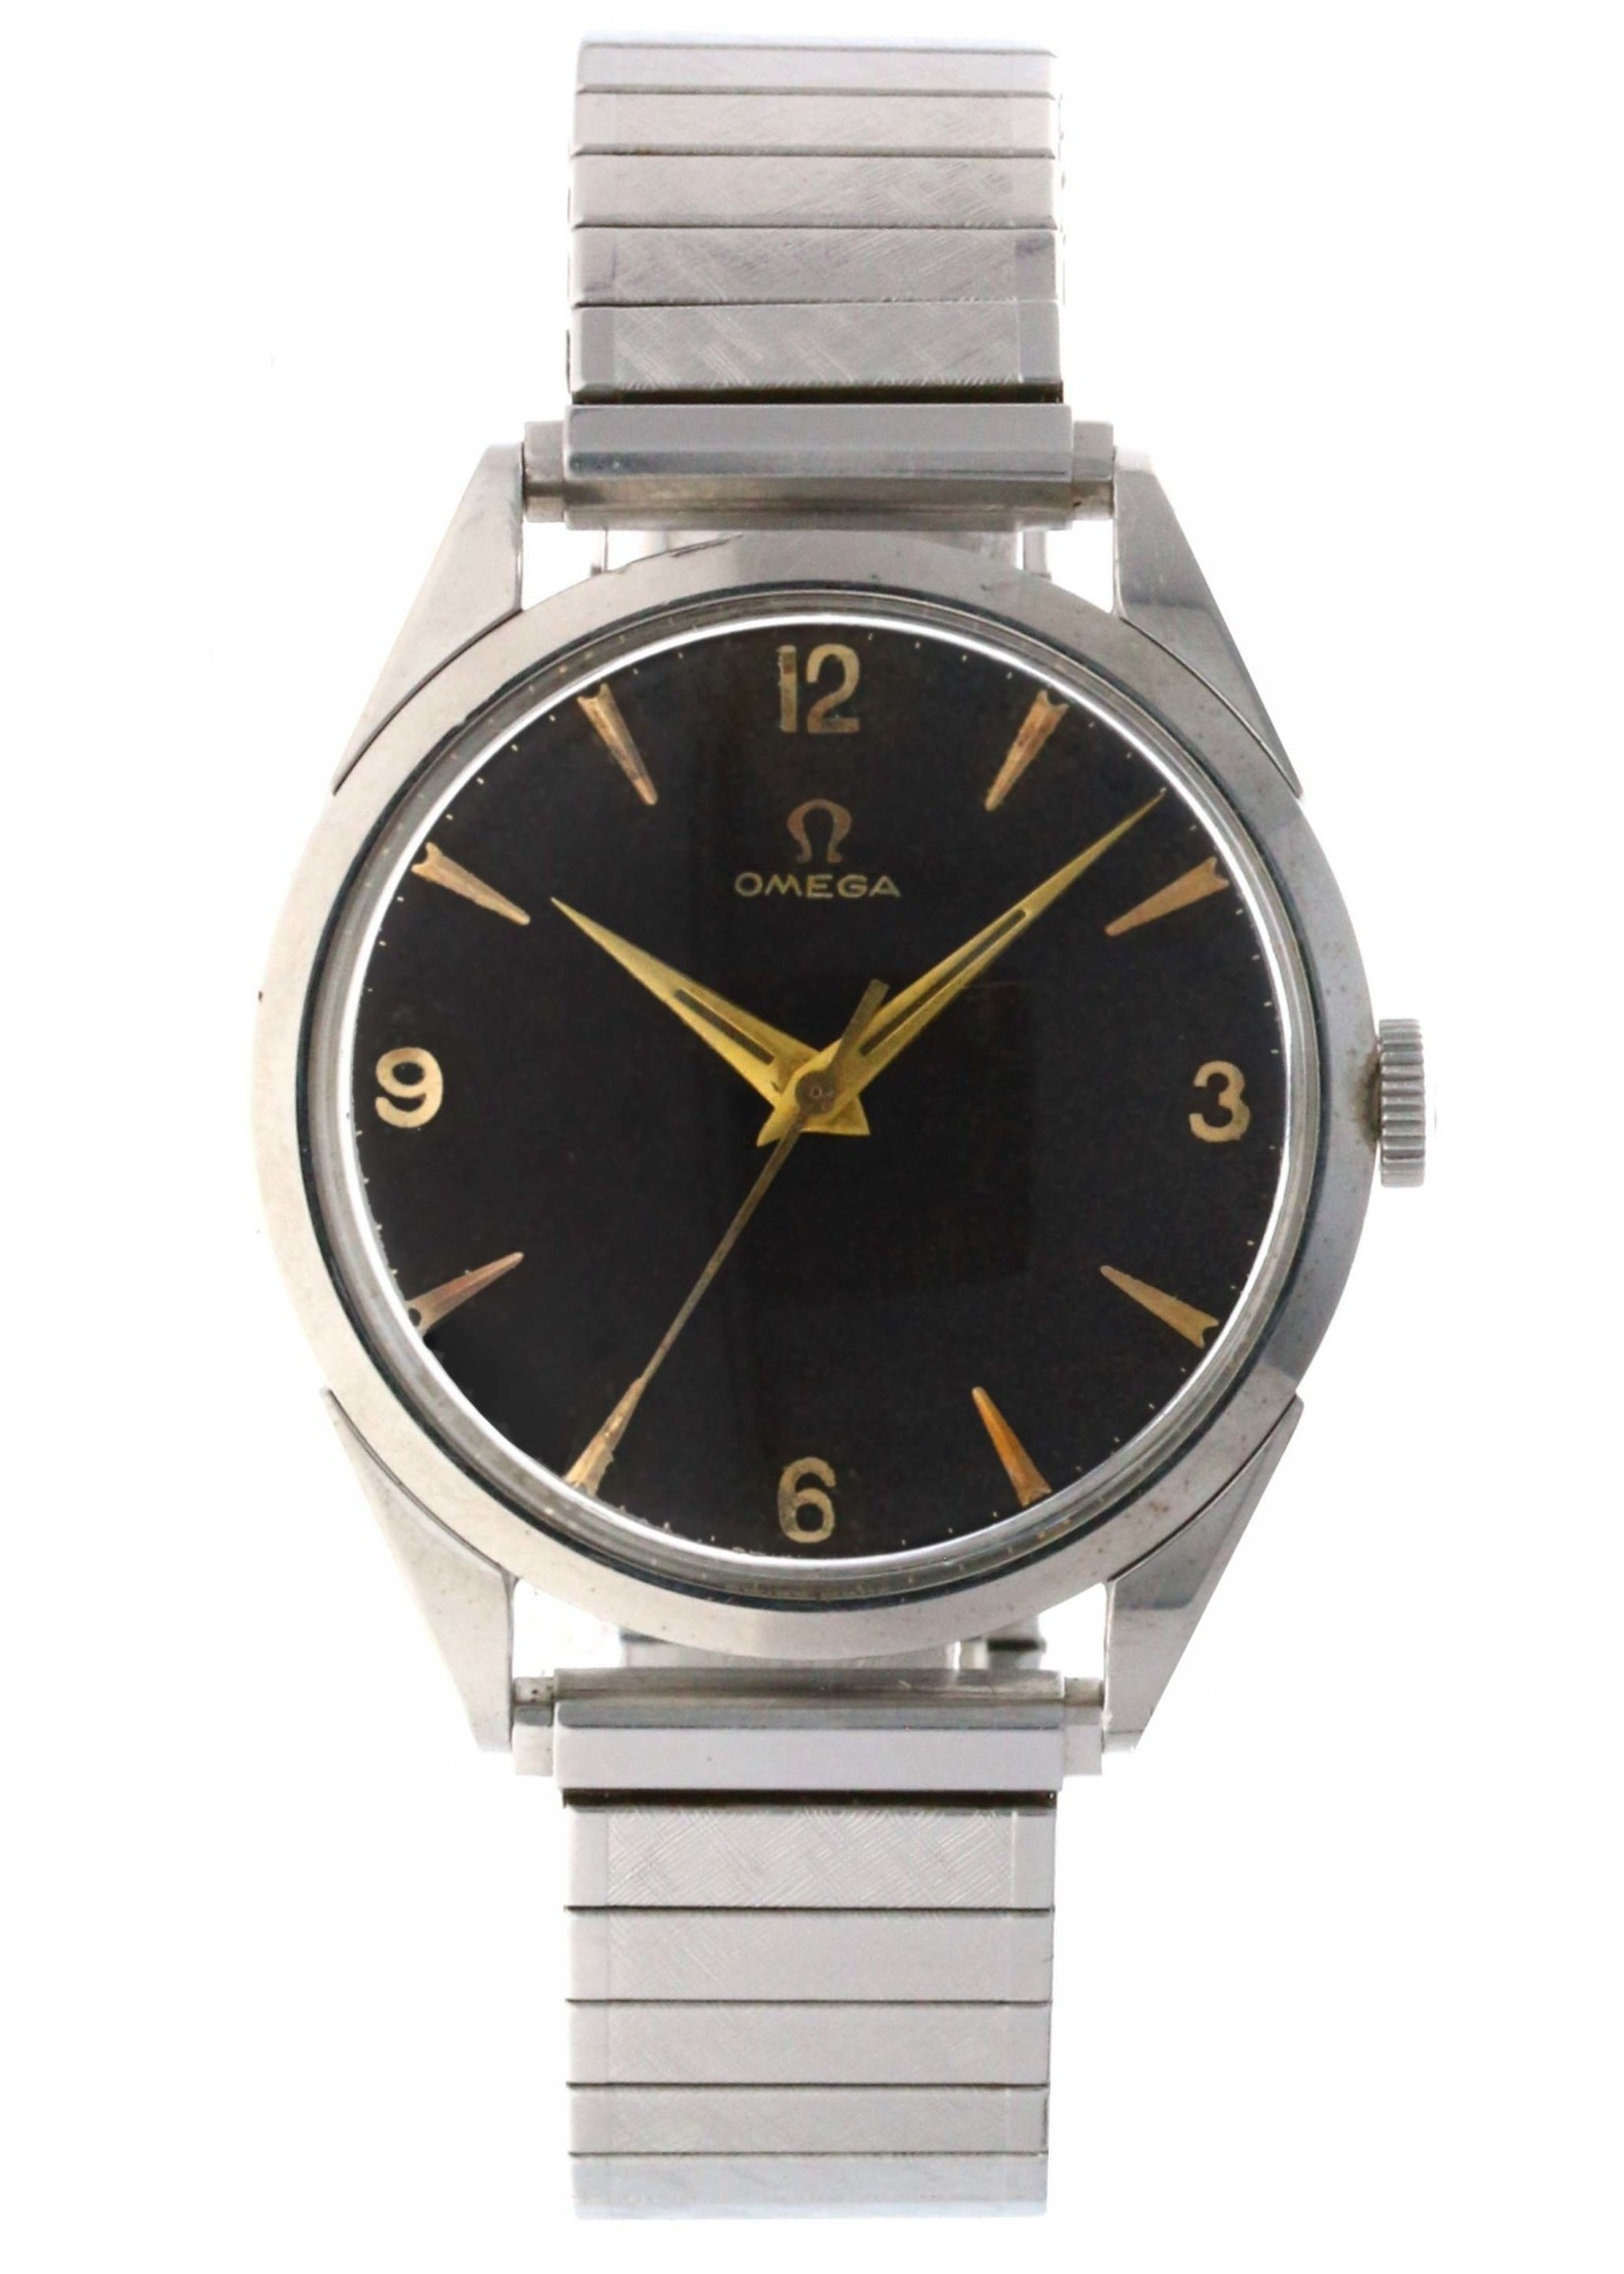 Omega Watches Vintage Omega #2910-2 sc